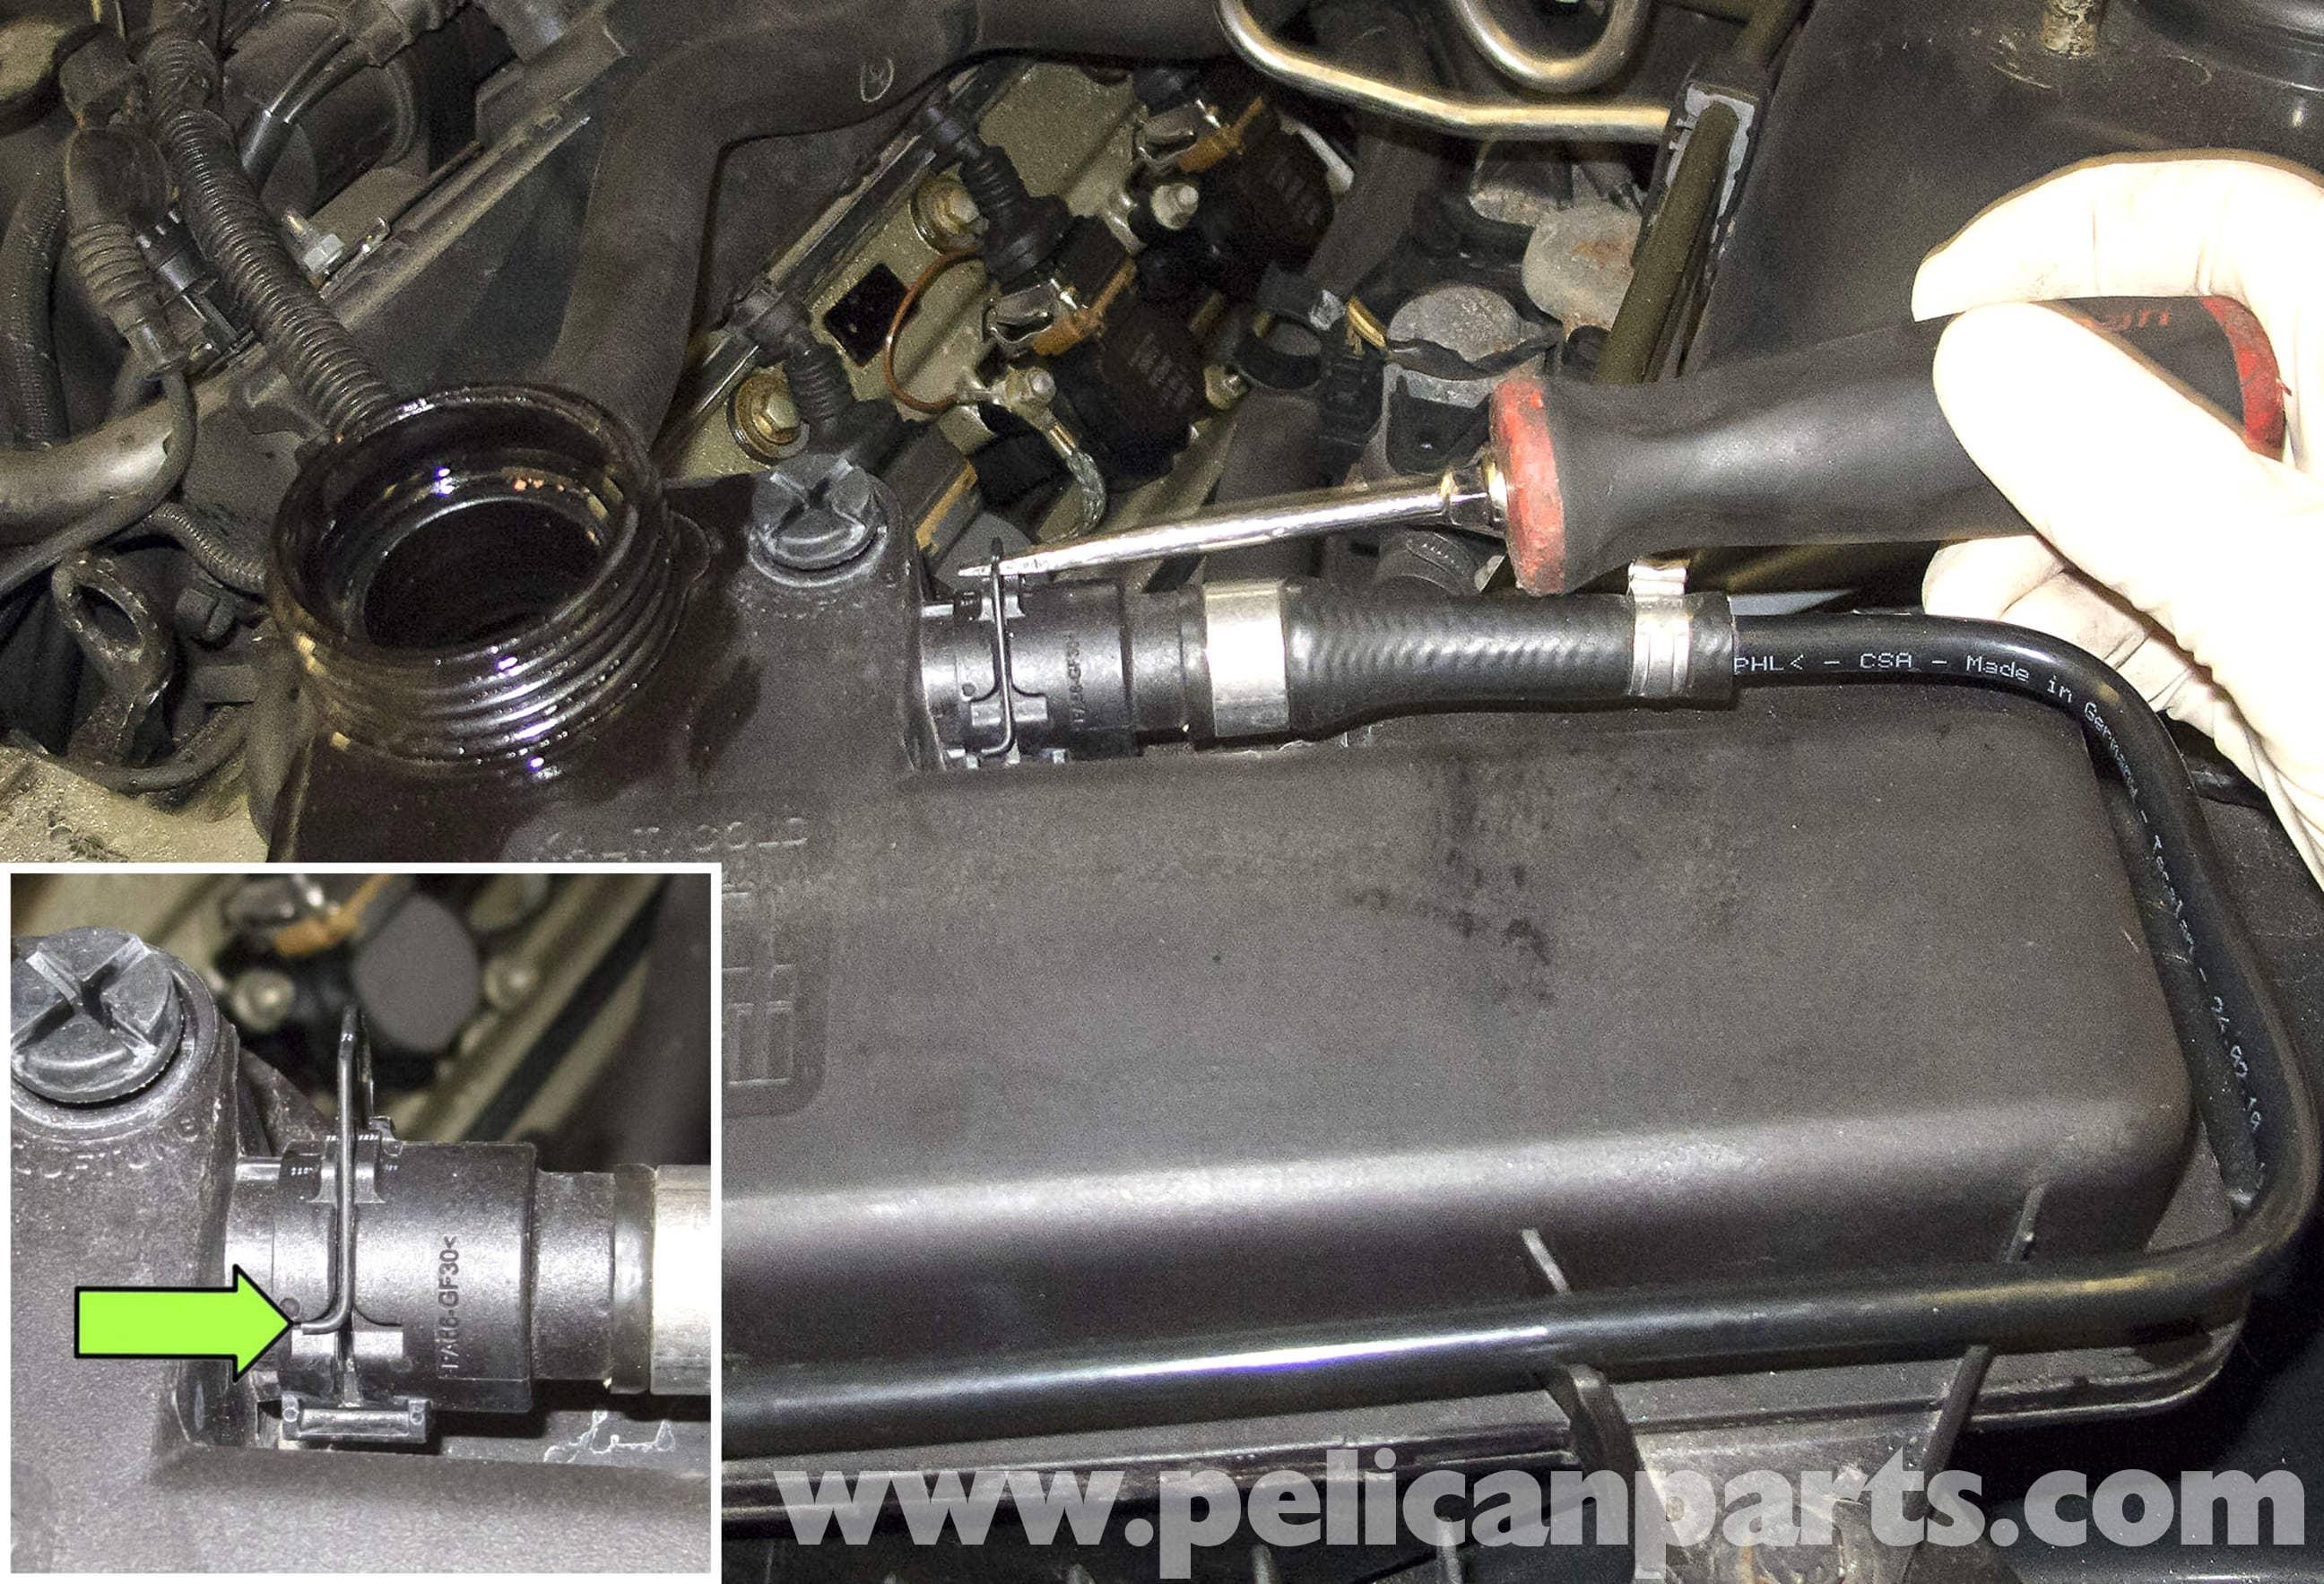 Bmw x5 coolant leak expansion tank